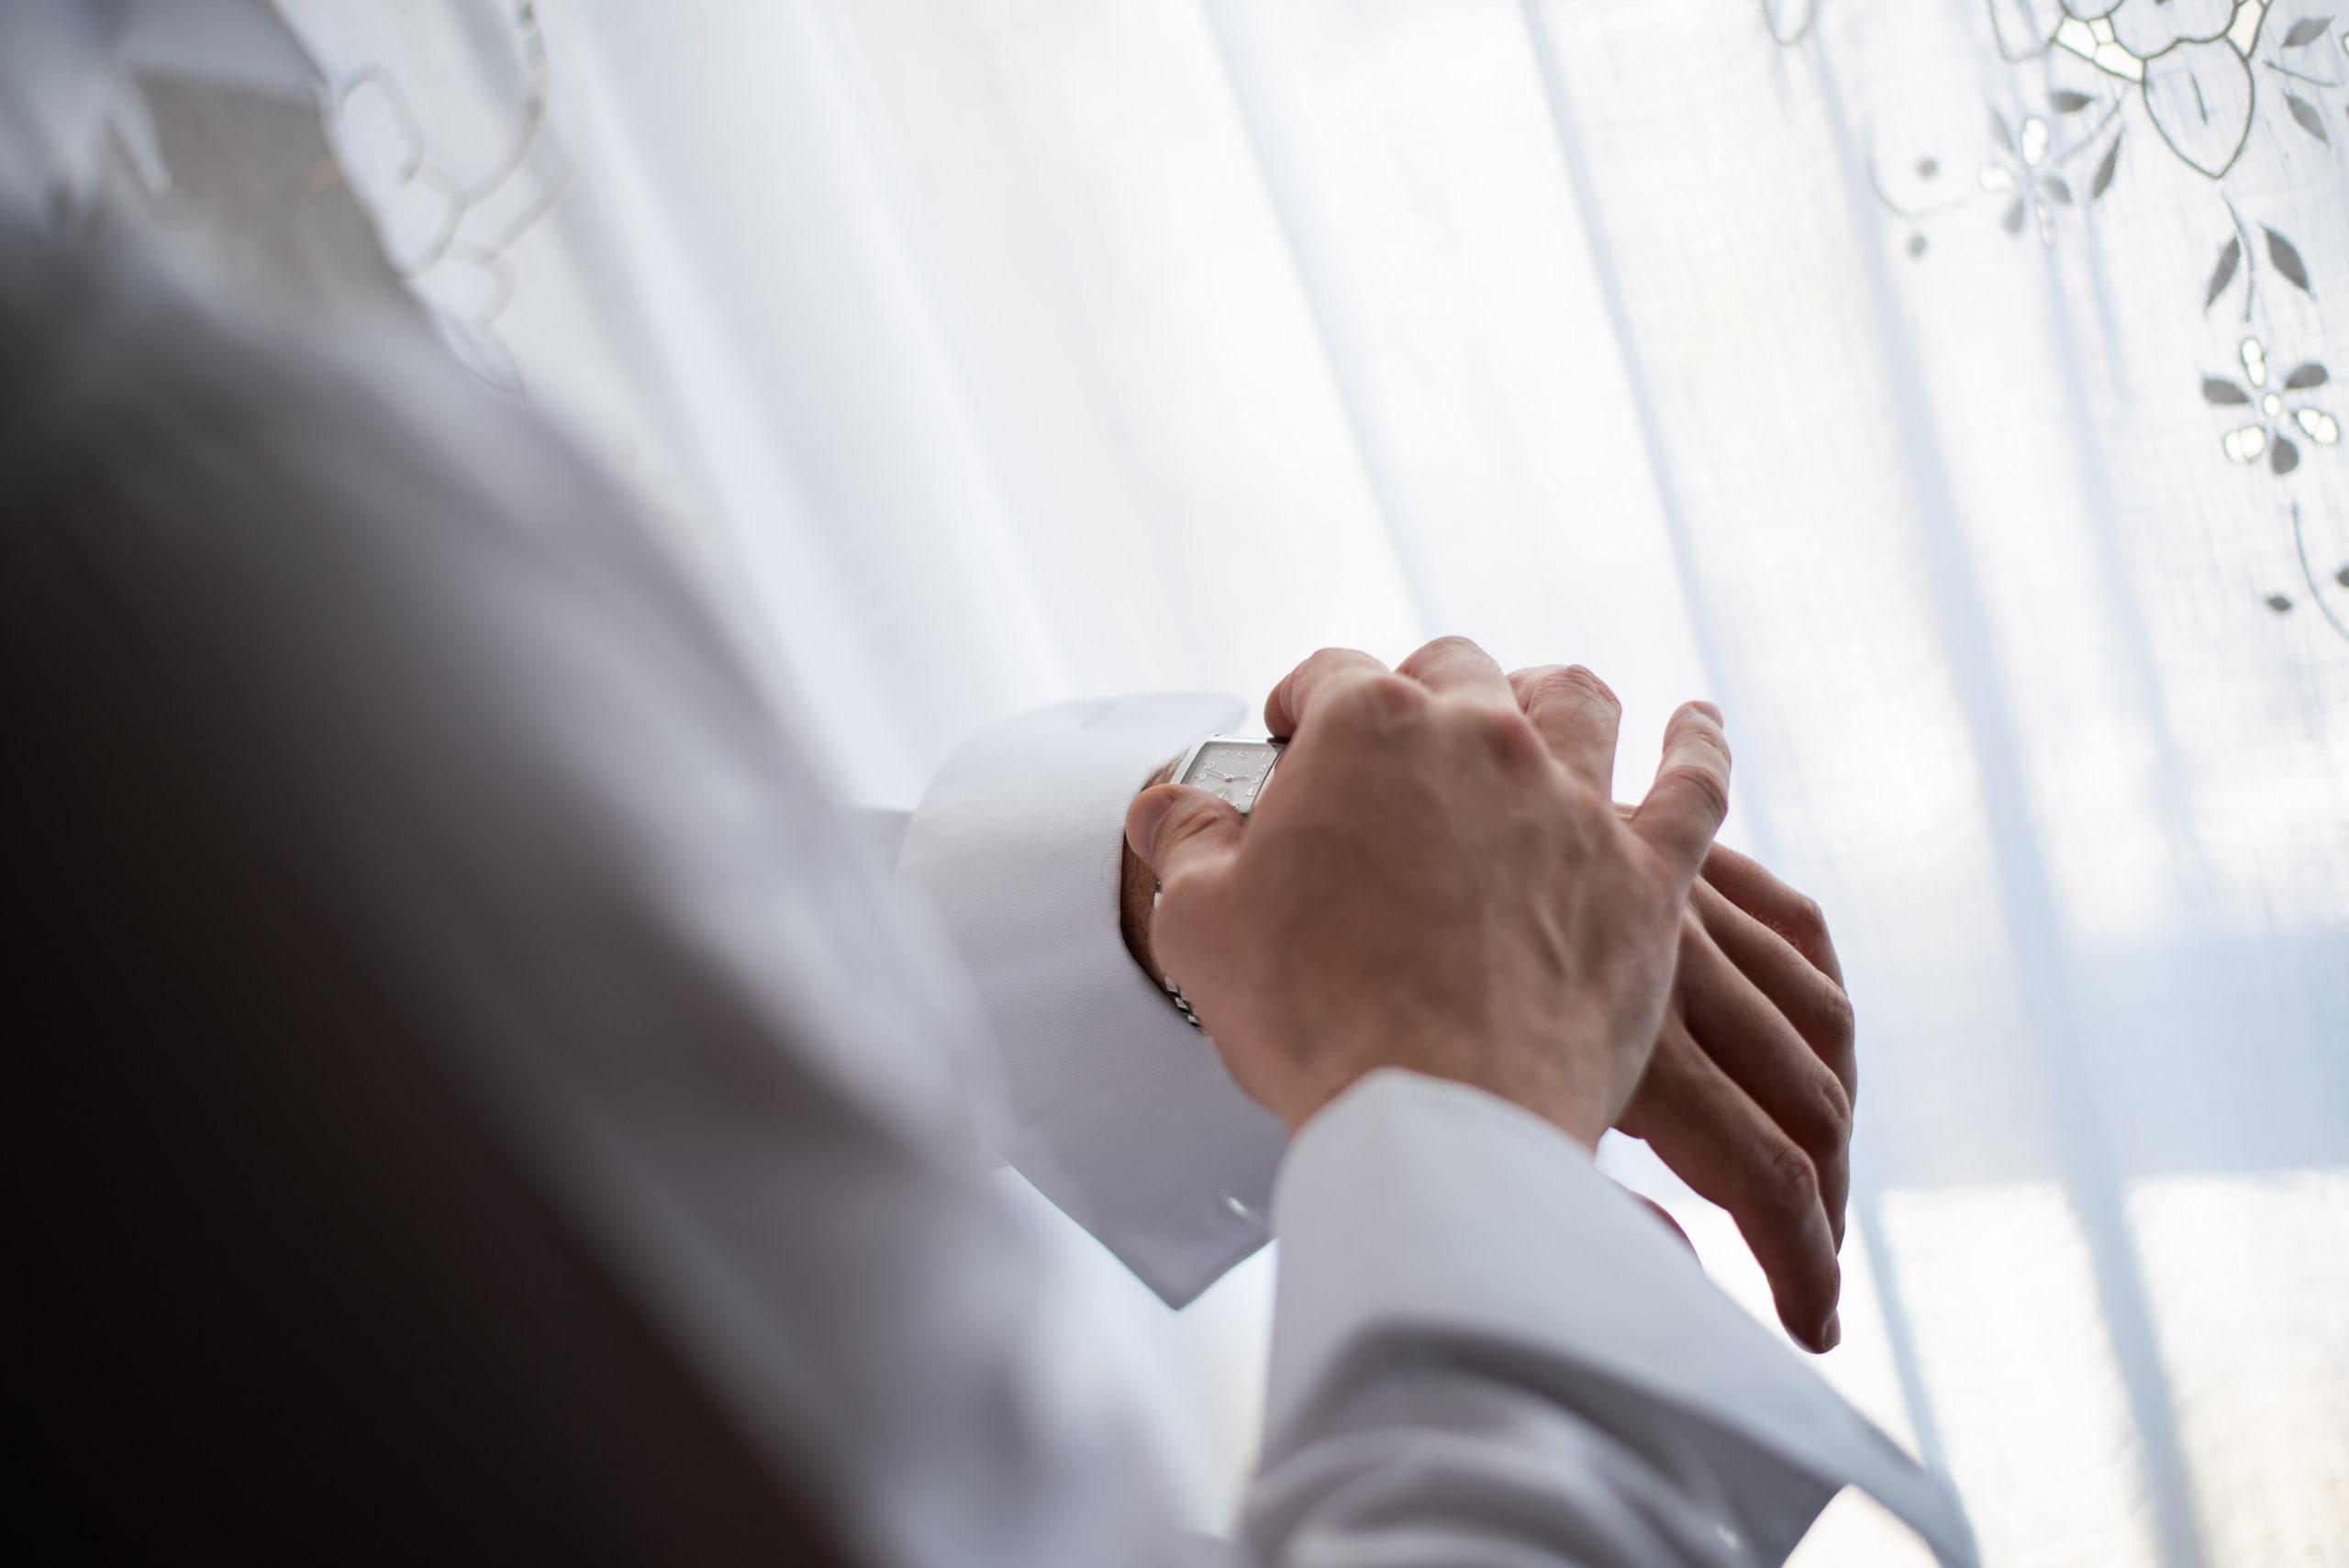 Groom Hands Detail Checking Wrist Watch